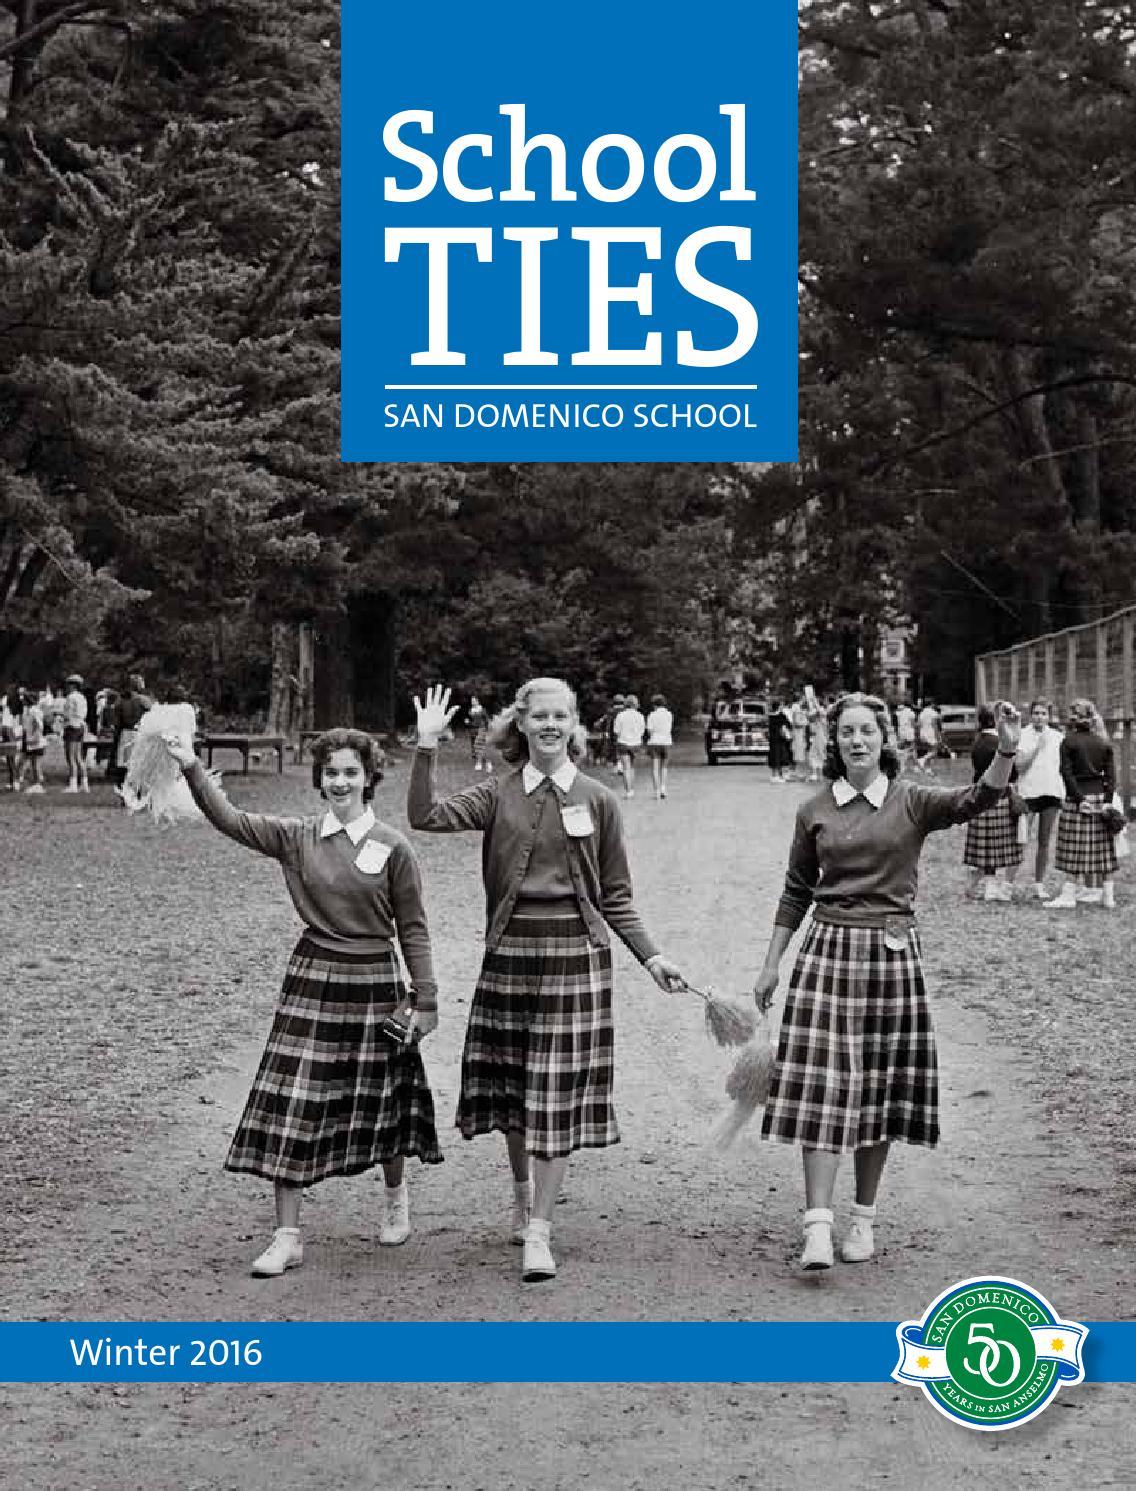 School Ties Winter 2016 By San Domenico